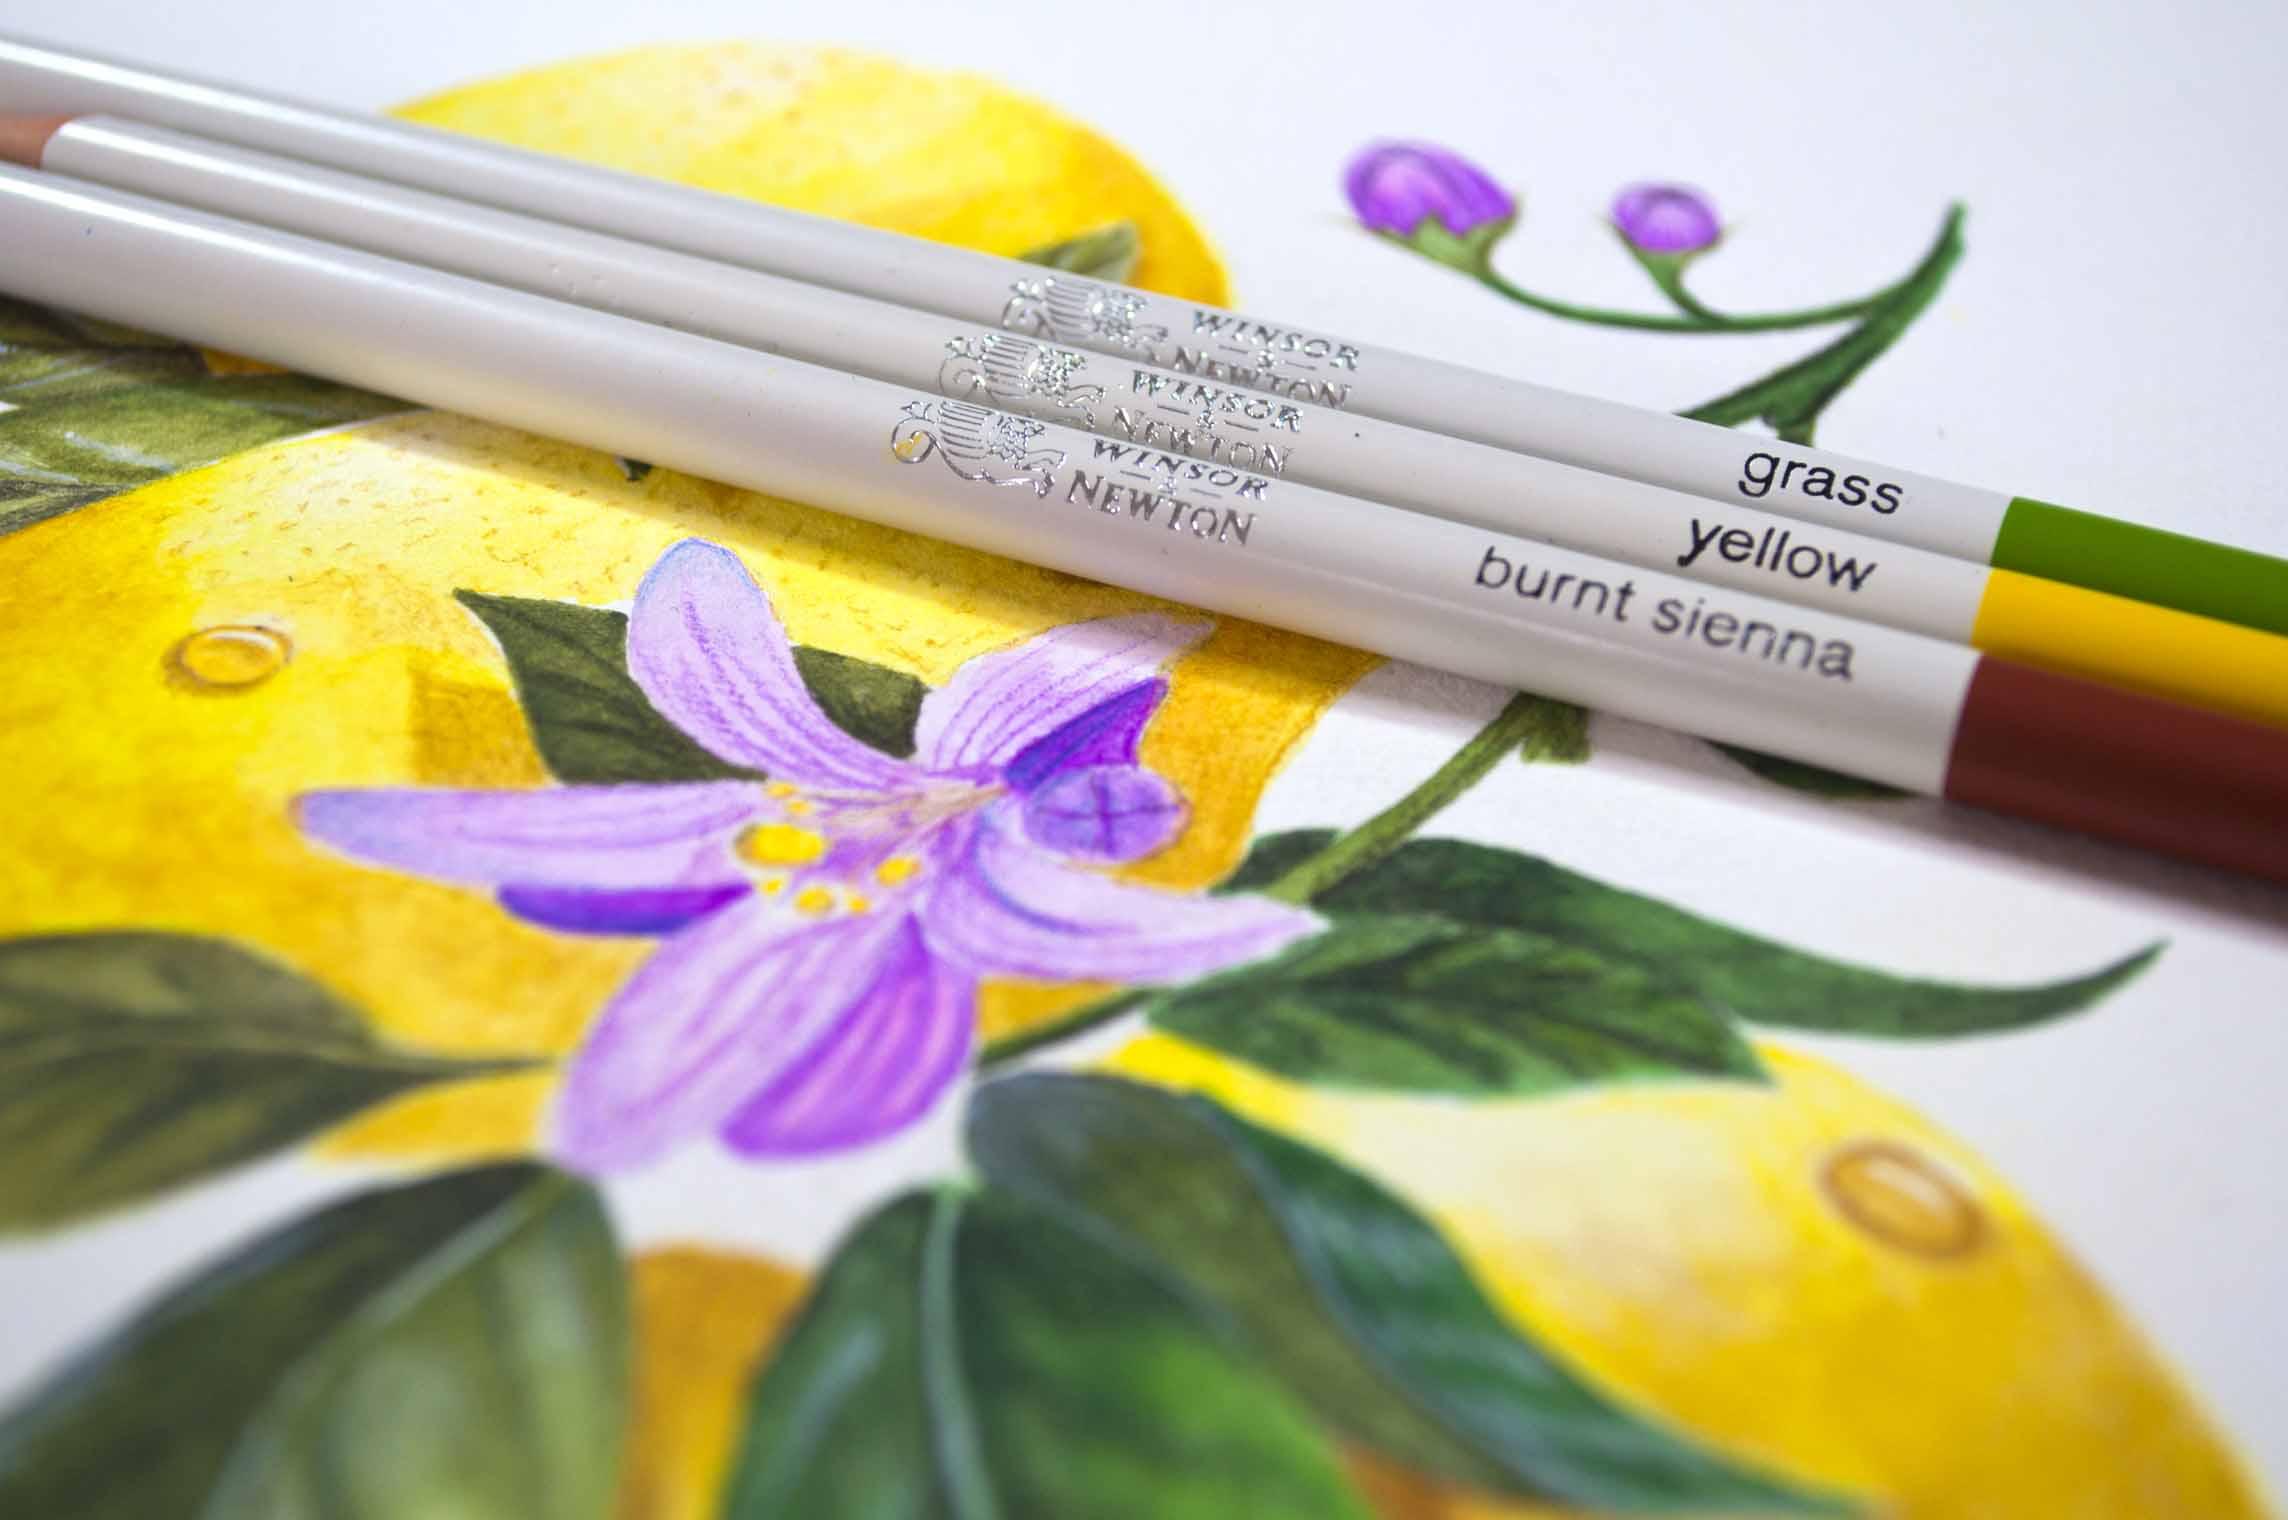 W&N Lemons with 3 pencils design shot.jpg